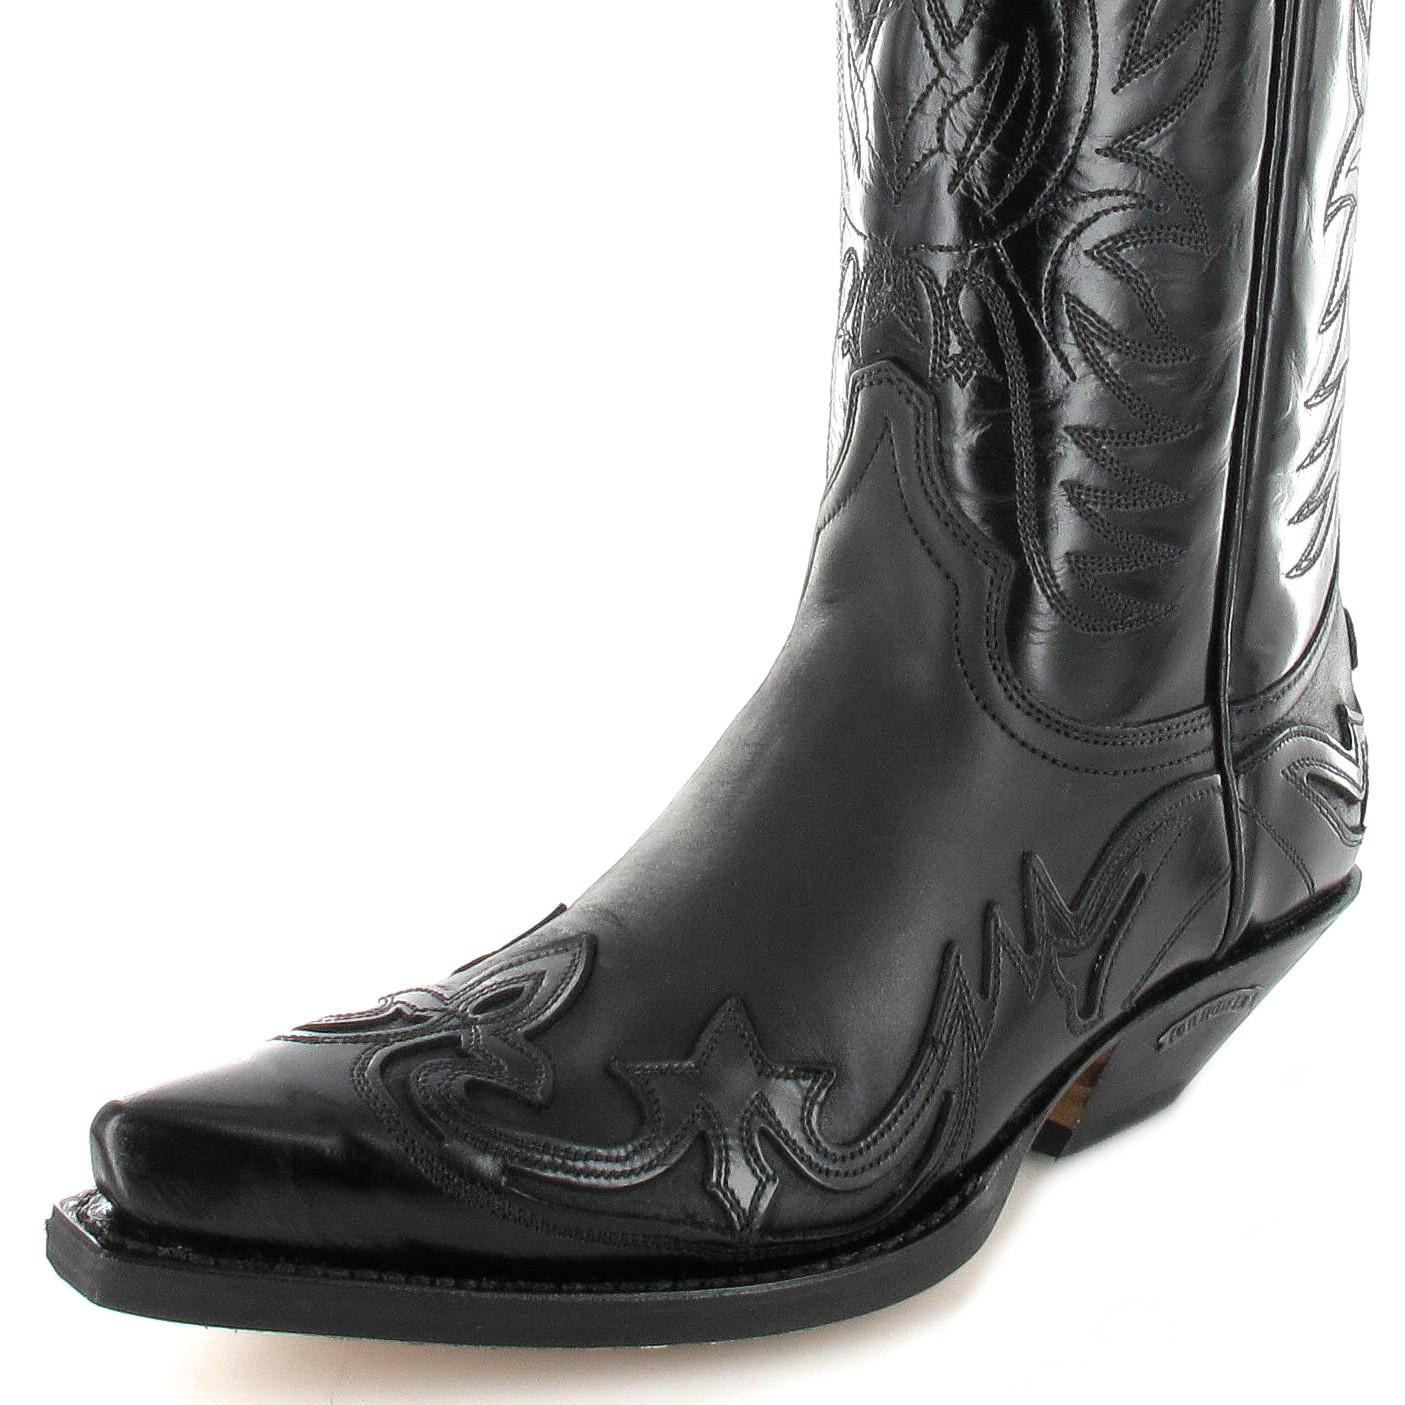 ... sendra boots 3241 negro western boot black image cemuhpq